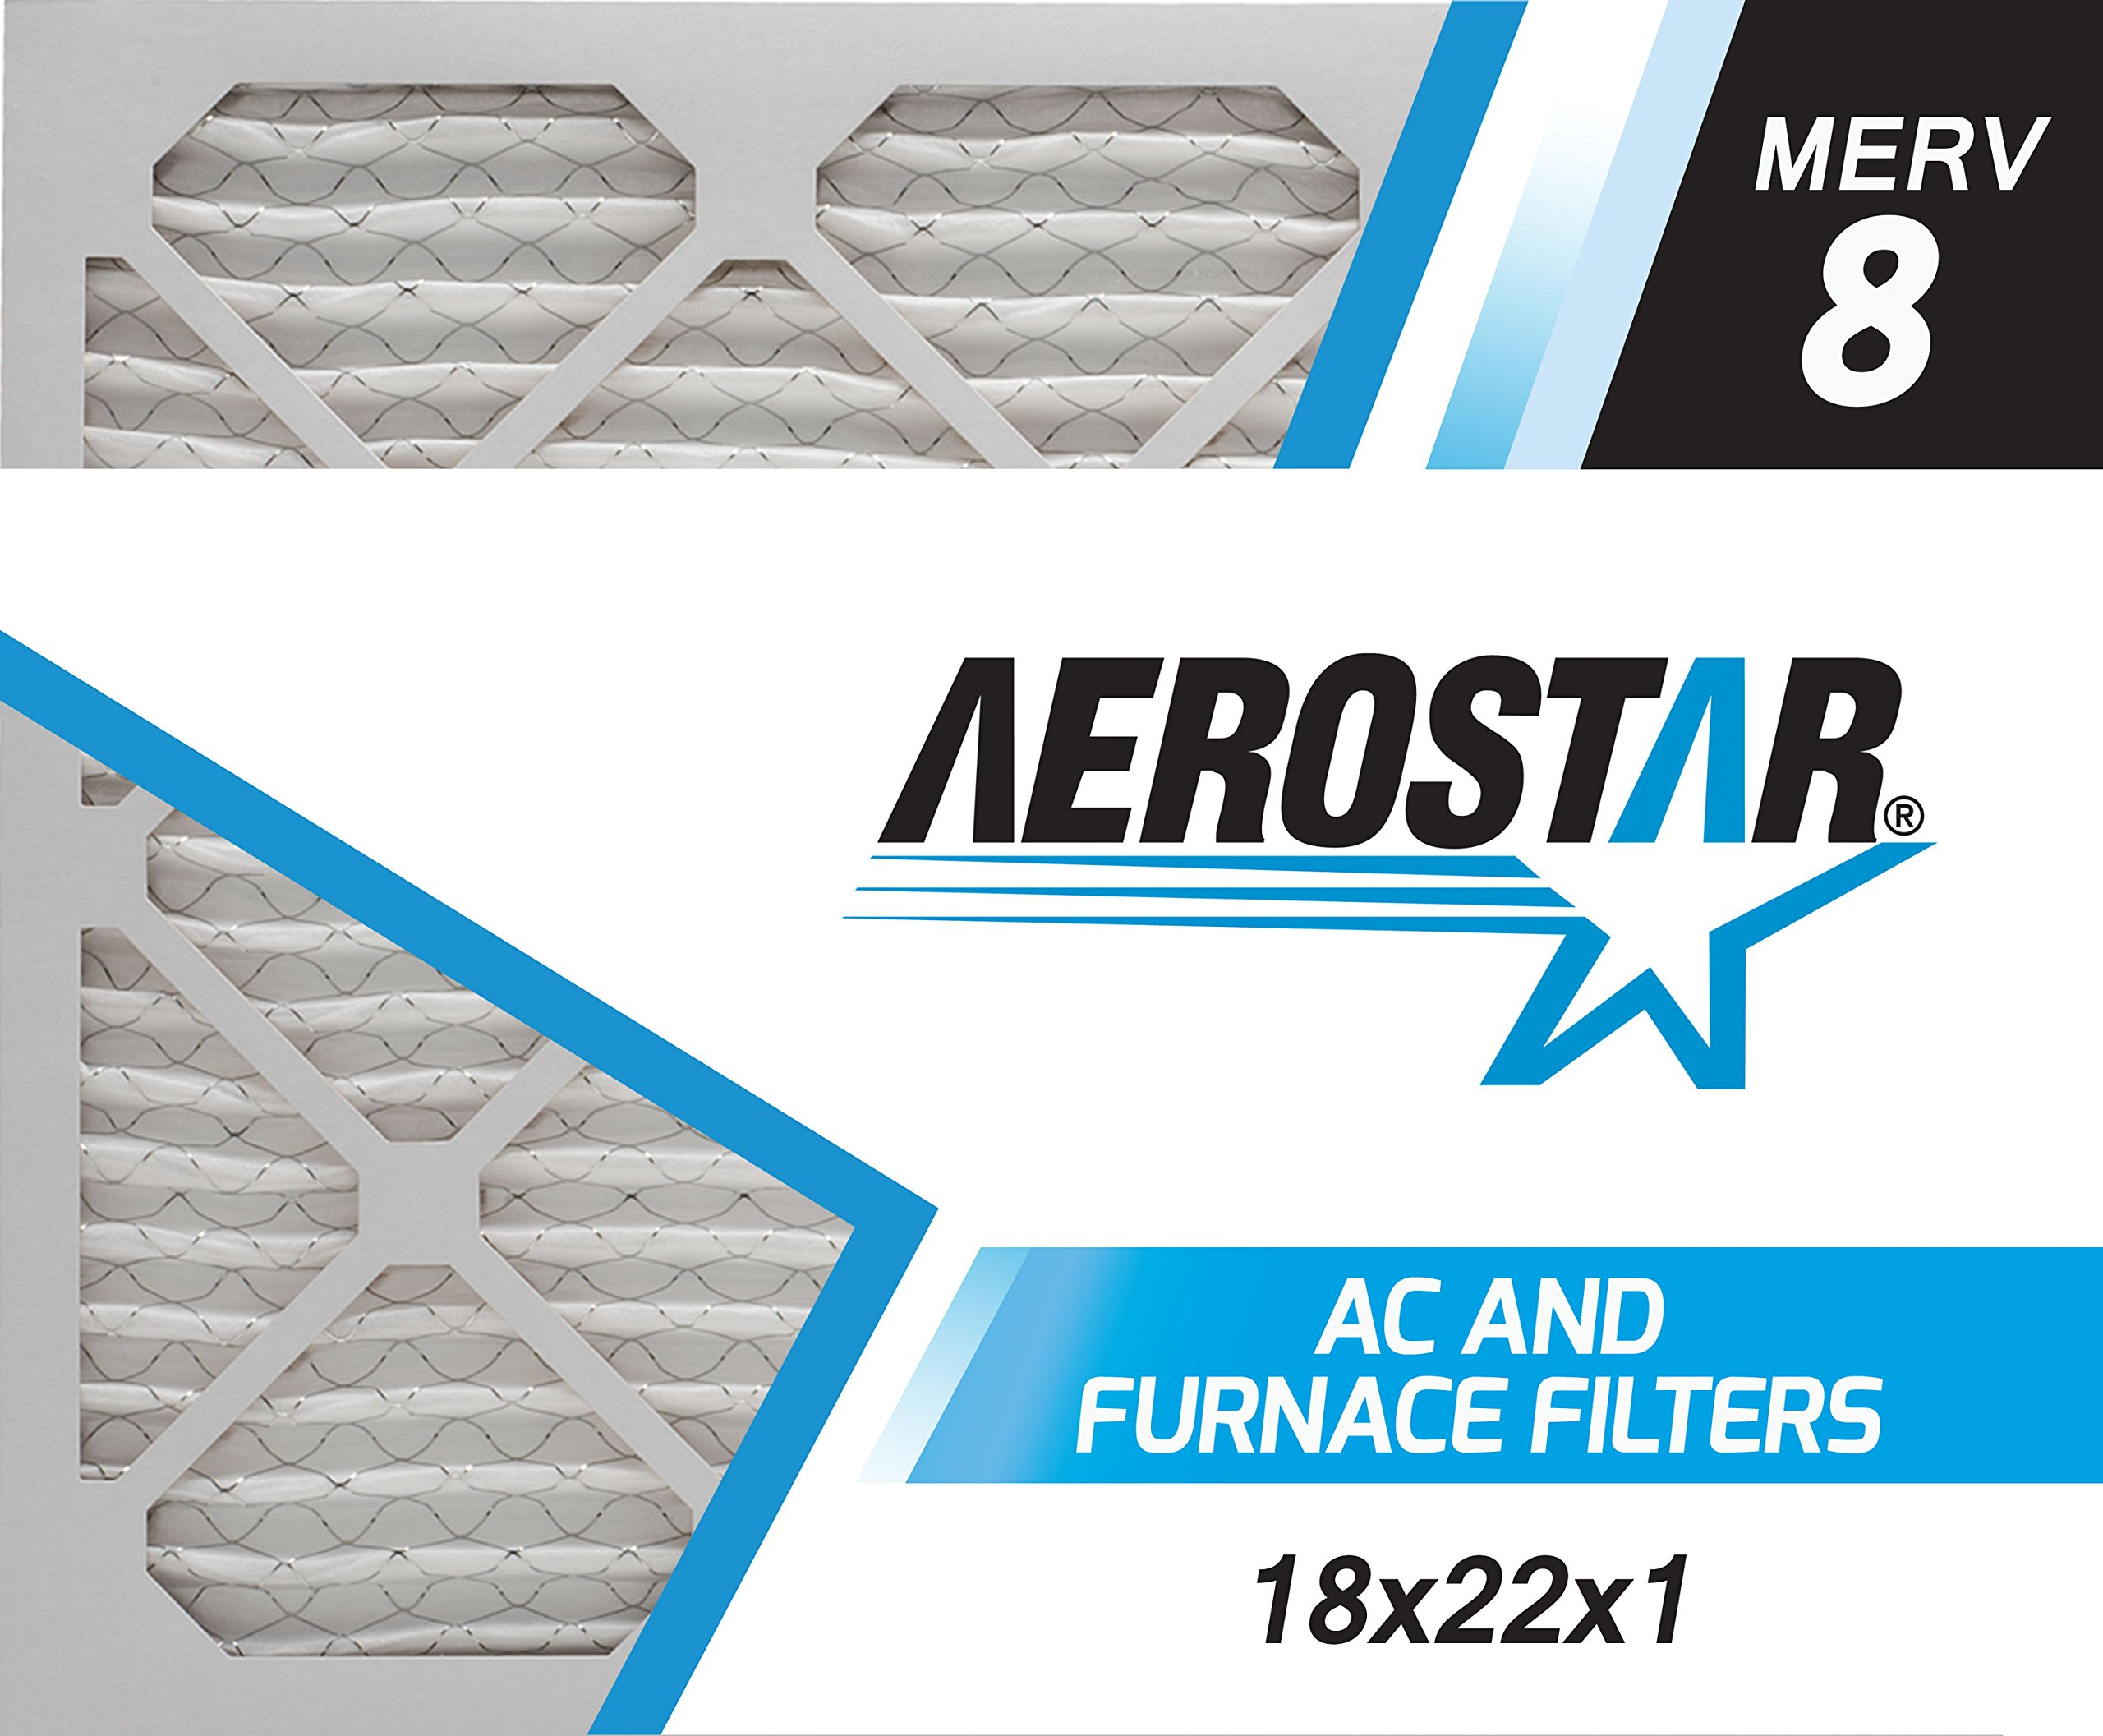 Aerostar 18x22x1 MERV 8, Pleated Air Filter, 18x22x1, Box of 4, Made in The USA